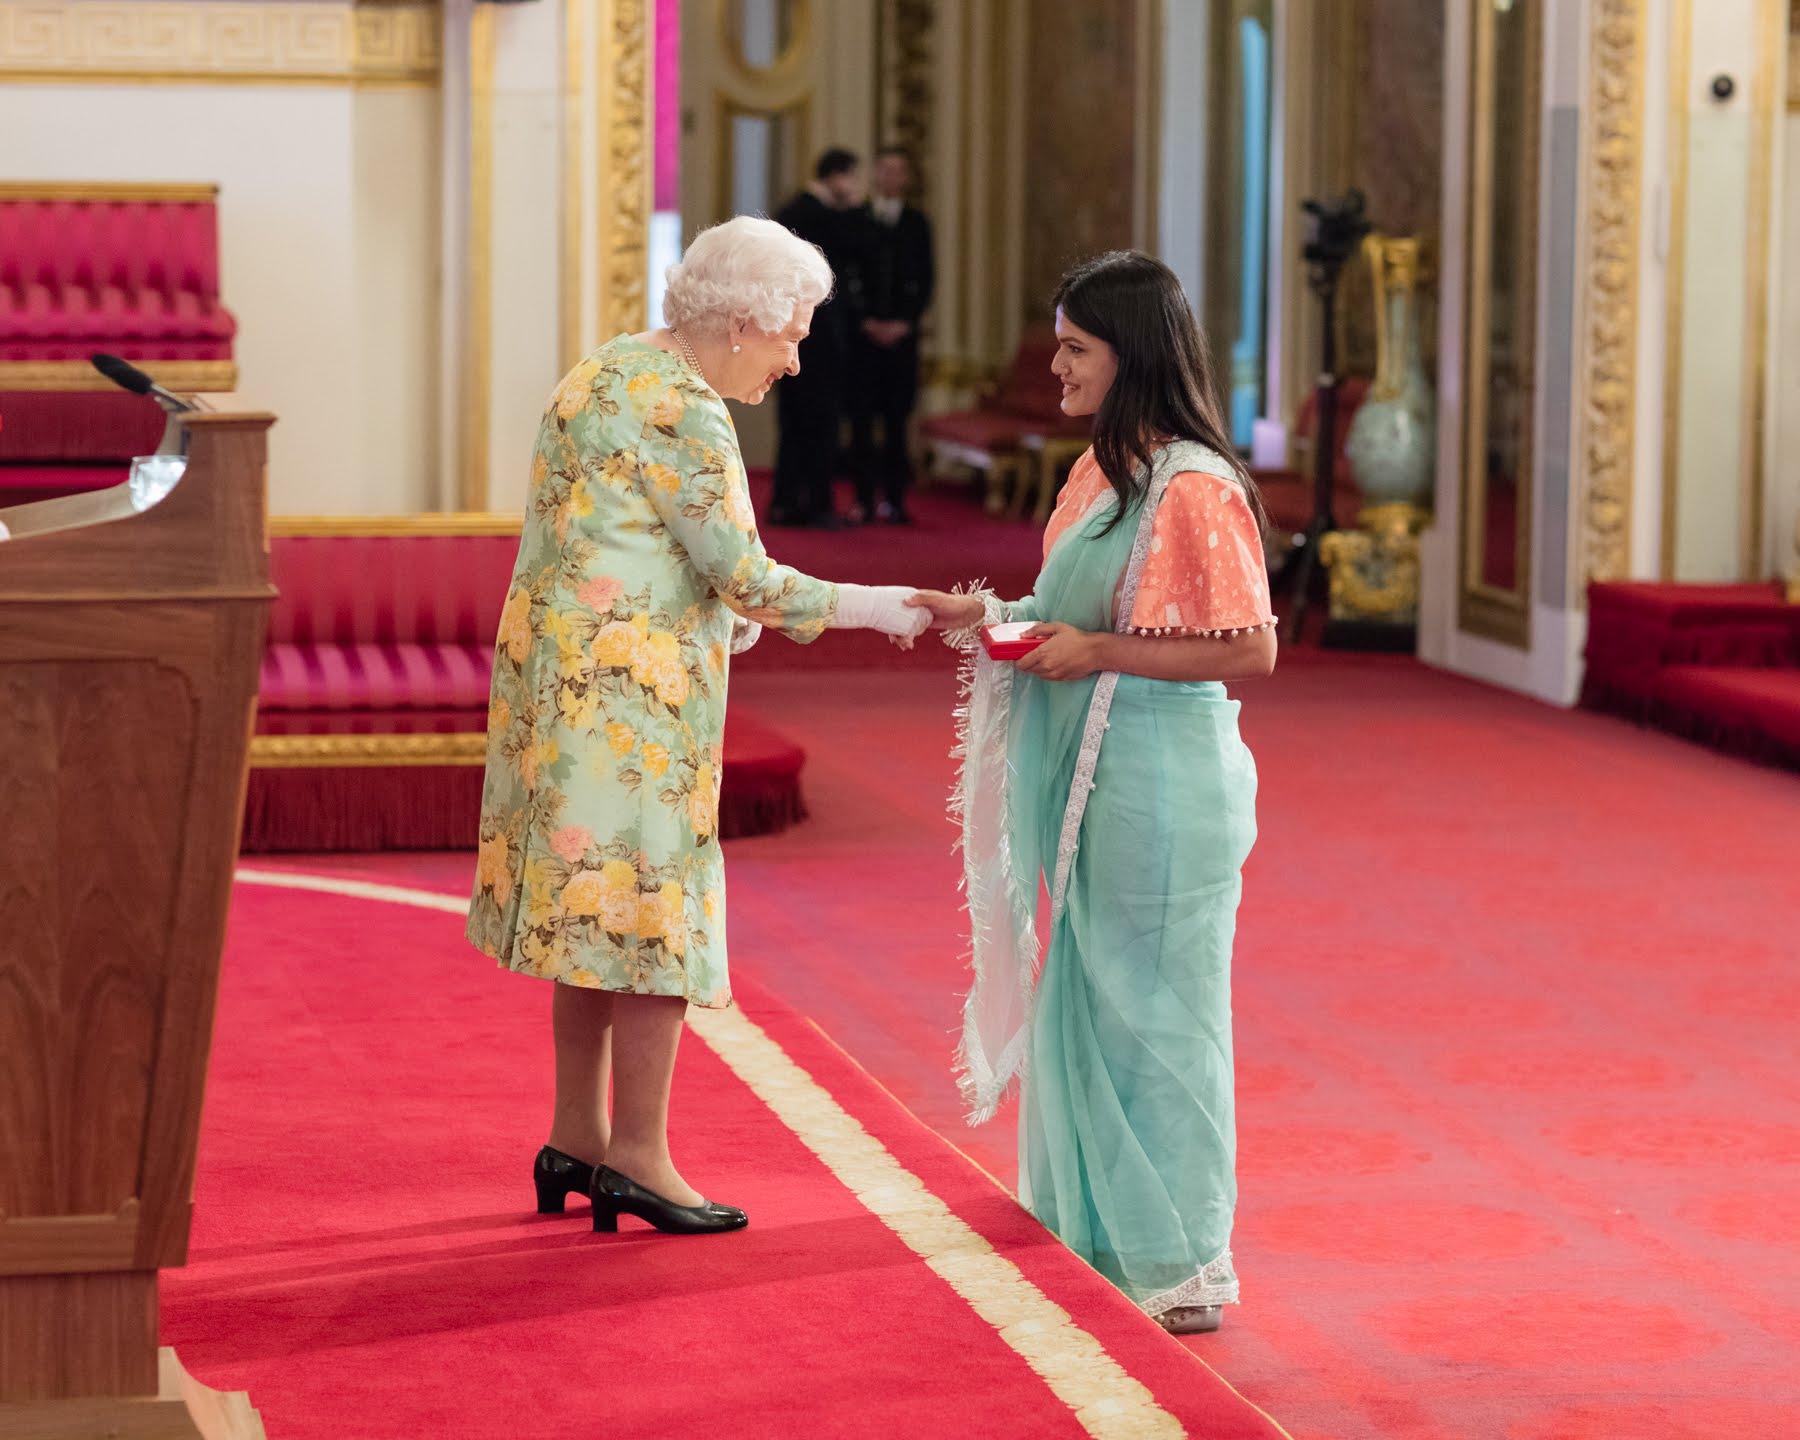 Zaiba Tahyya Bangladesh 2018 Queen's Young Leader